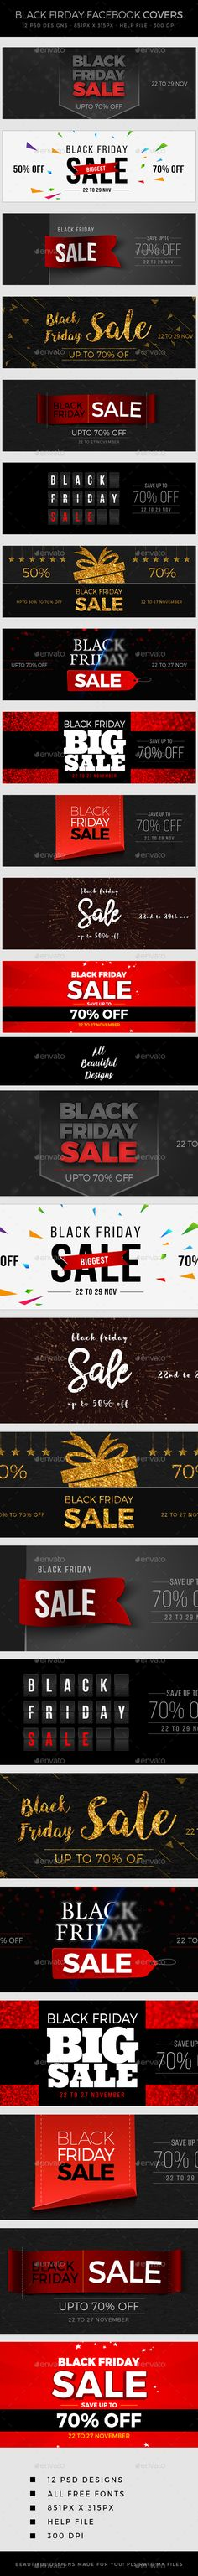 Black Friday Sale Facebook Cover Templates PSD